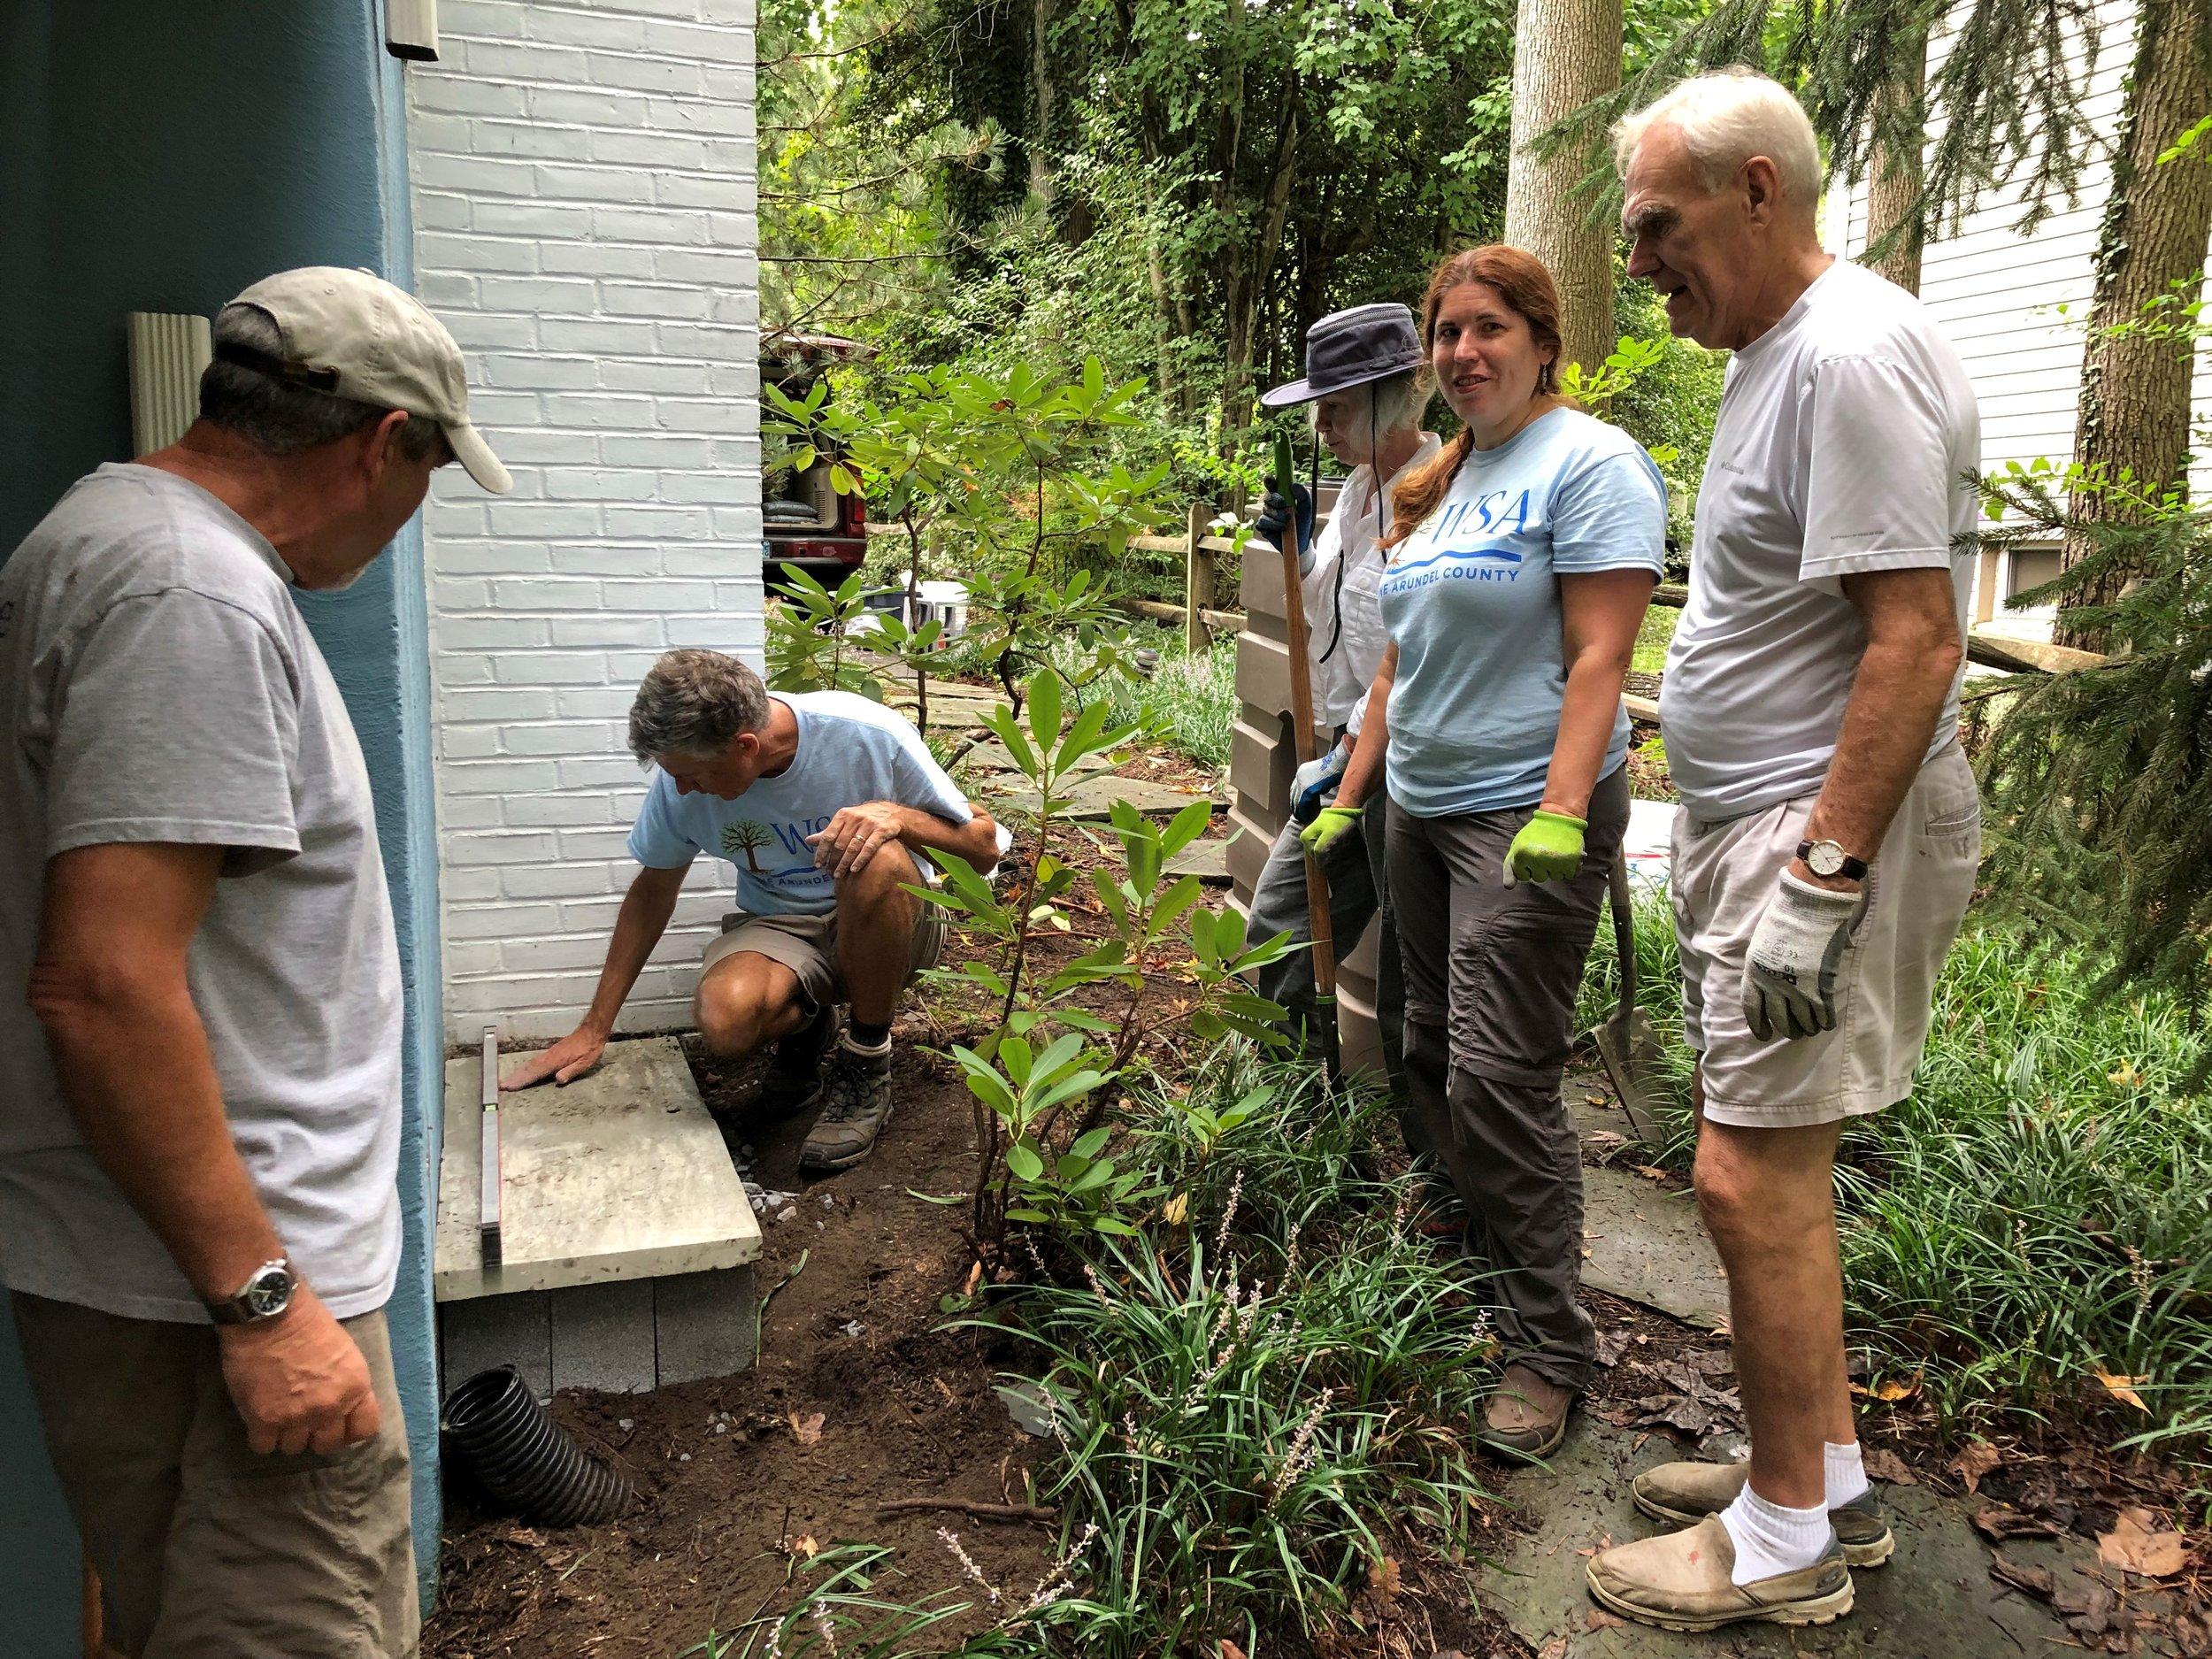 Kevin Green, Thomas Marston, Monica Maynard, Katie Matta and Marc Wirig install a rain barrel in Hillsmere.